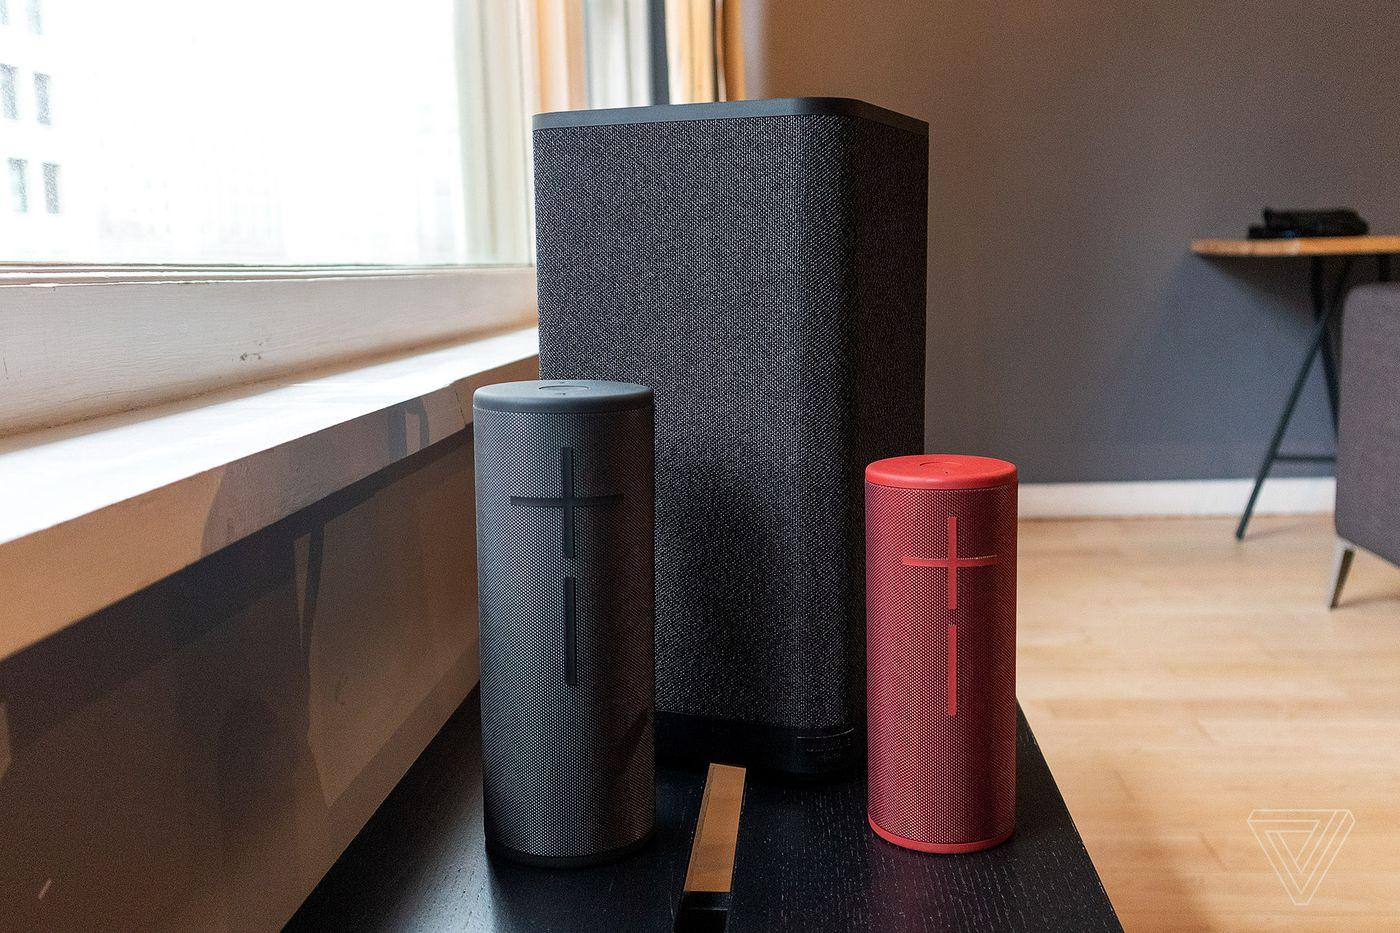 The new Ultimate Ears HyperBoom is a big, versatile party speaker